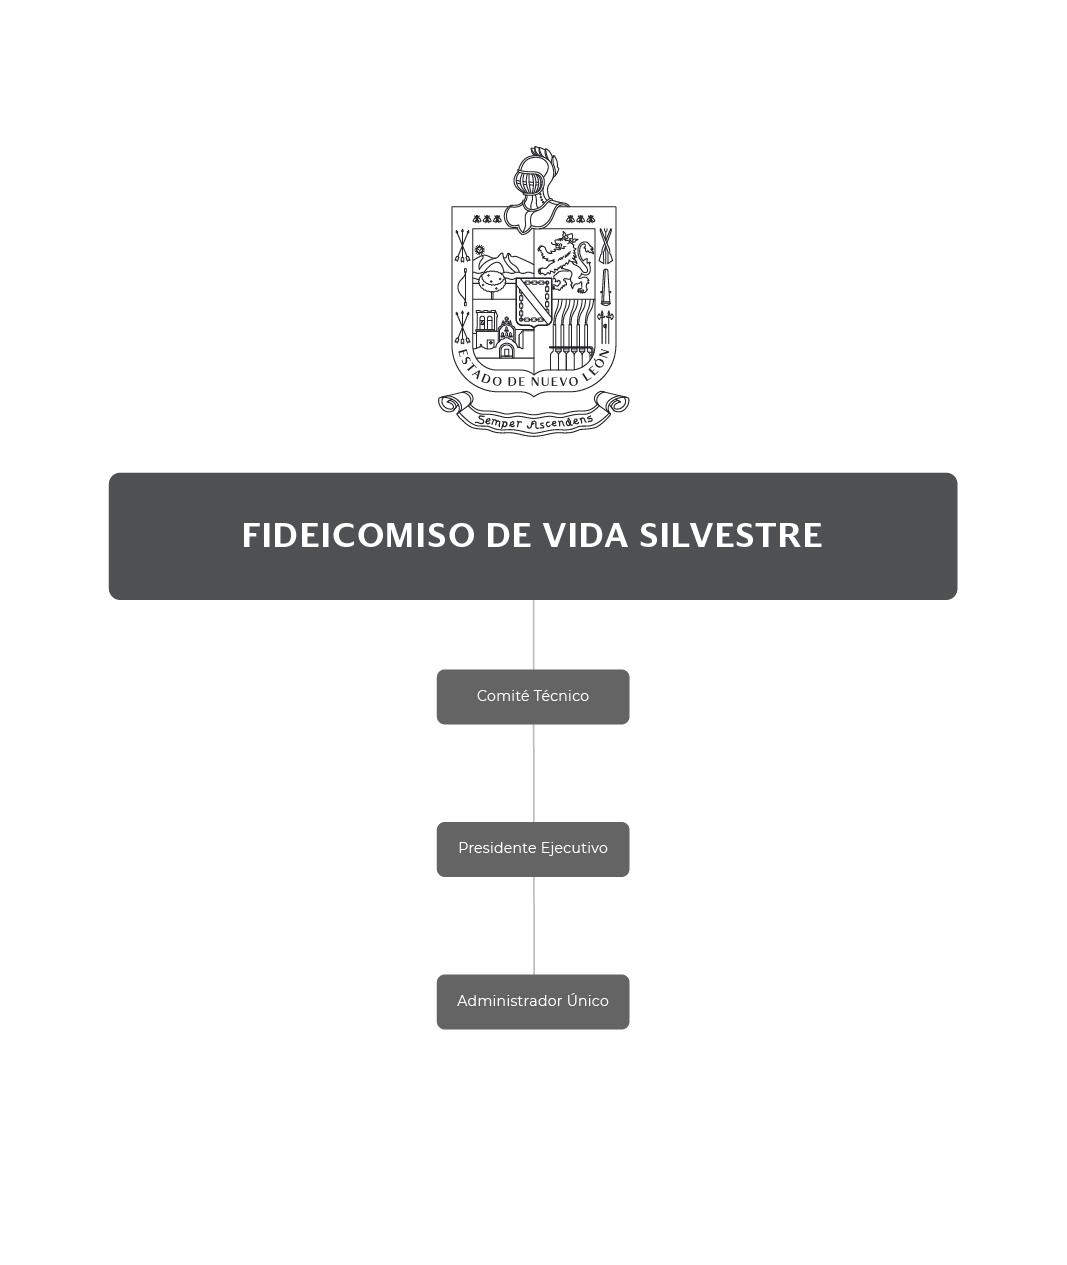 Organigrama del Fideicomiso de Vida Silvestre